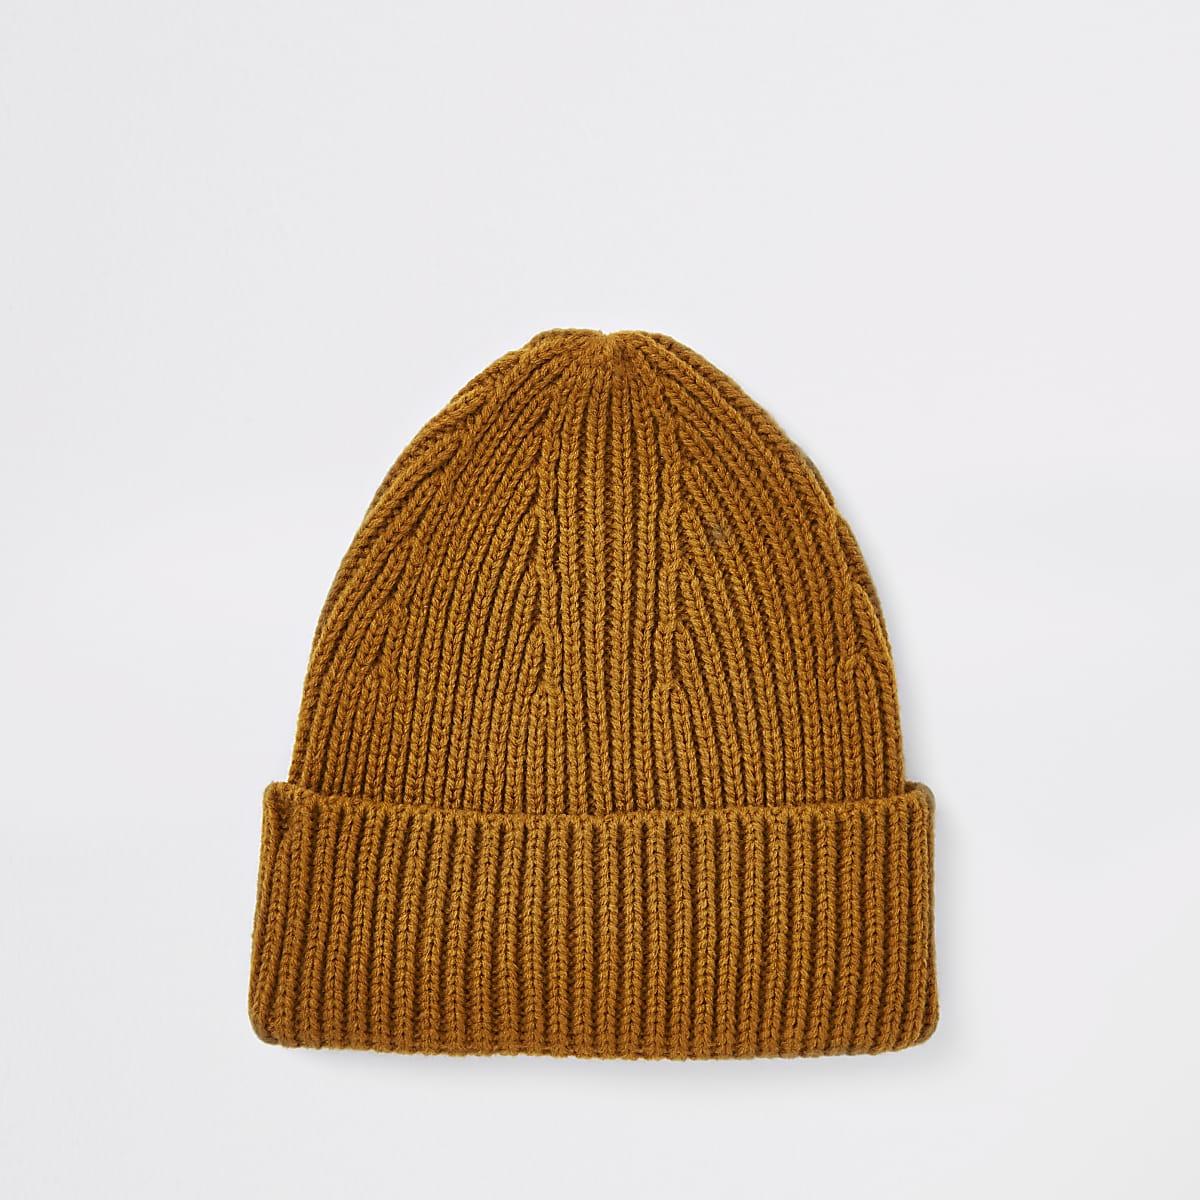 a688a891 Yellow fisherman beanie hat